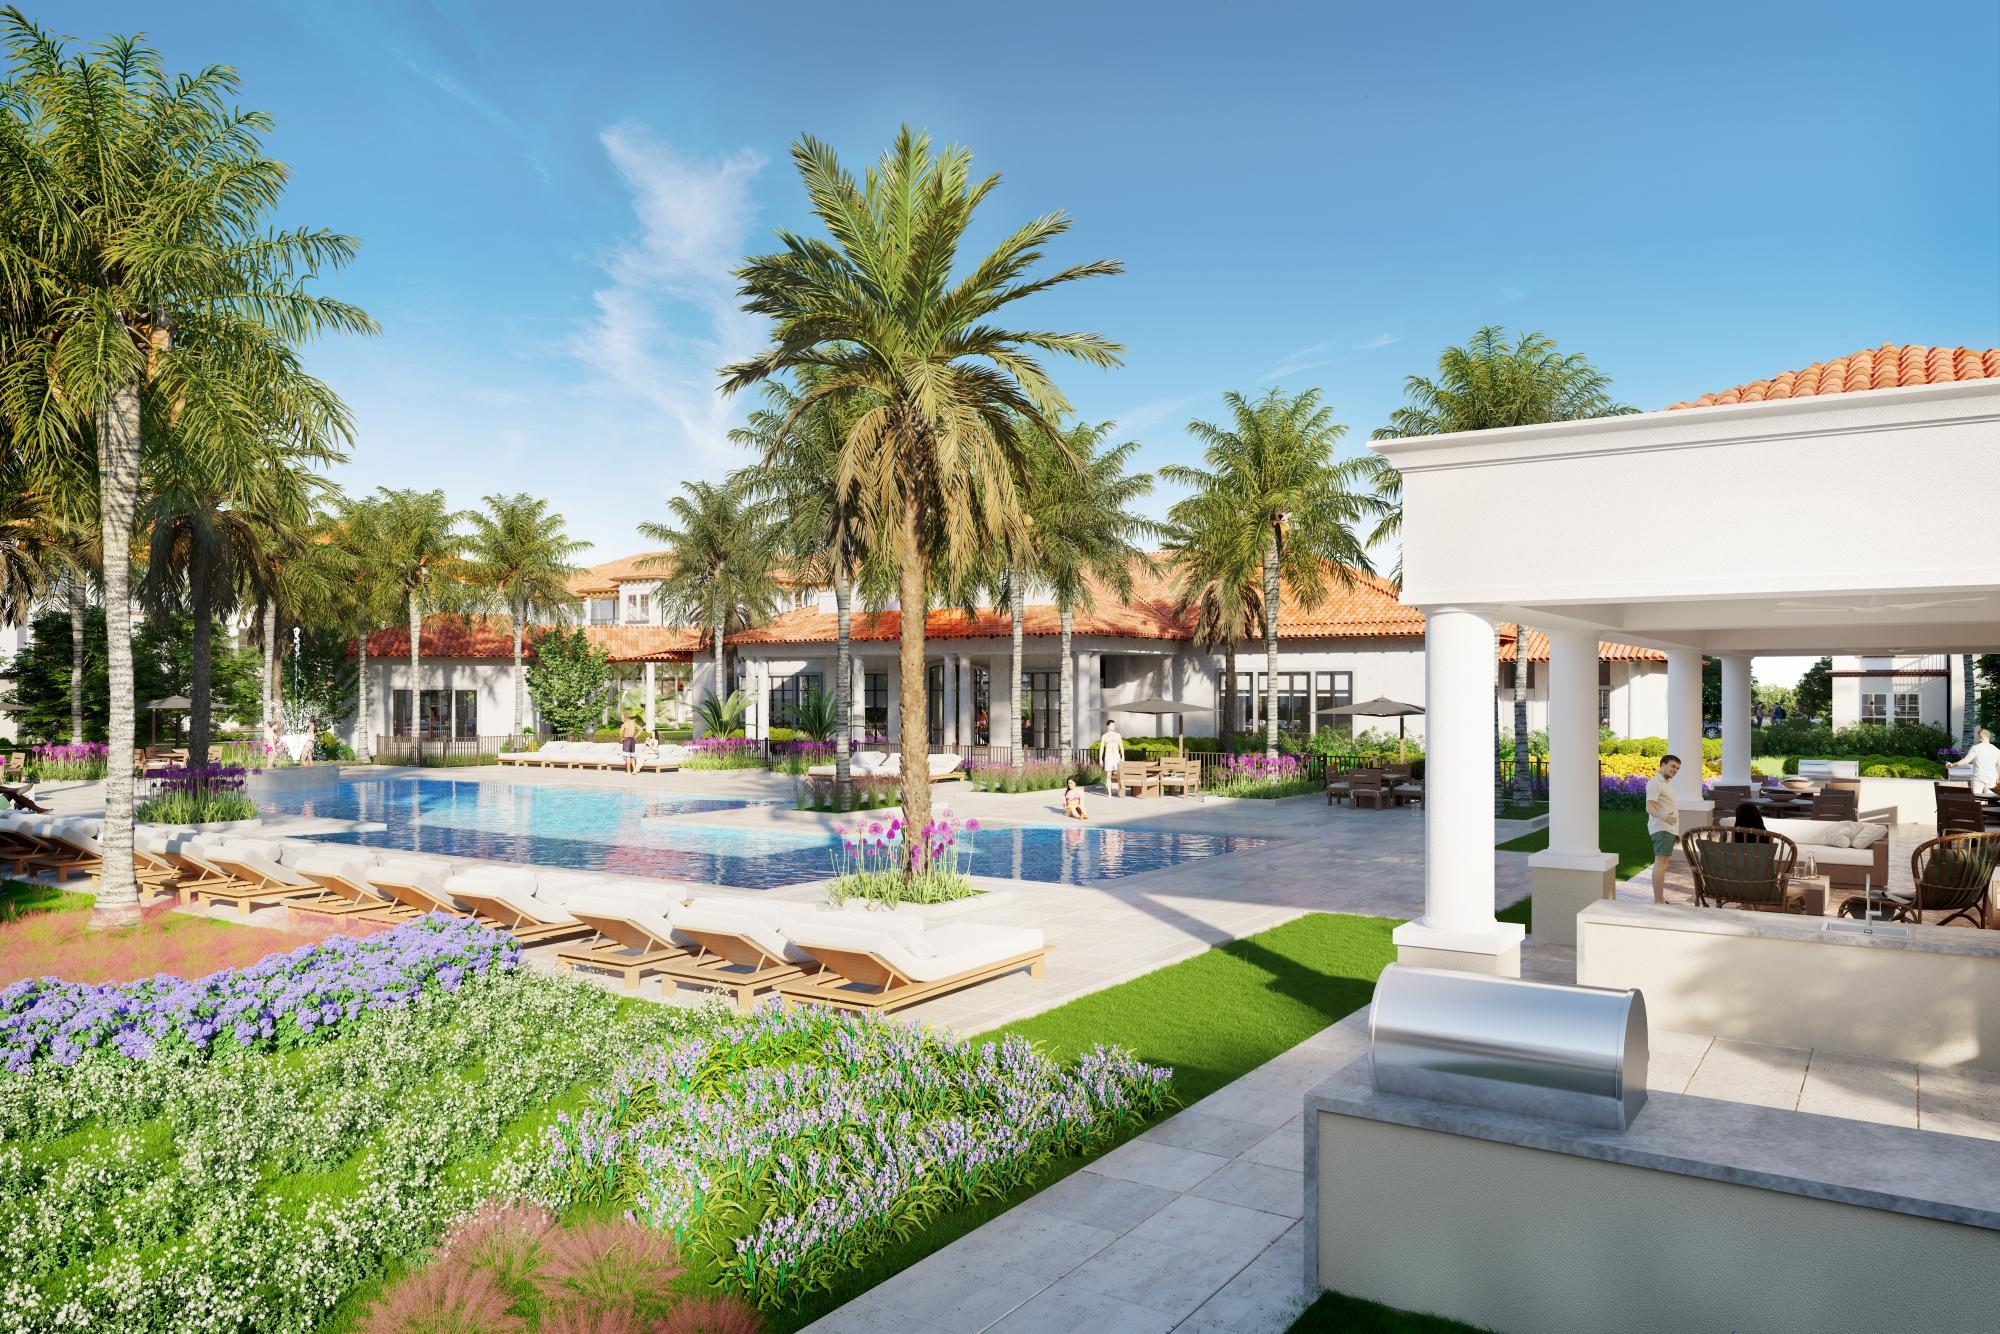 Bainbridge Continues Strategic Expansion with Management of 297-Unit Minneola Hills Apartment Community in Orlando, Florida